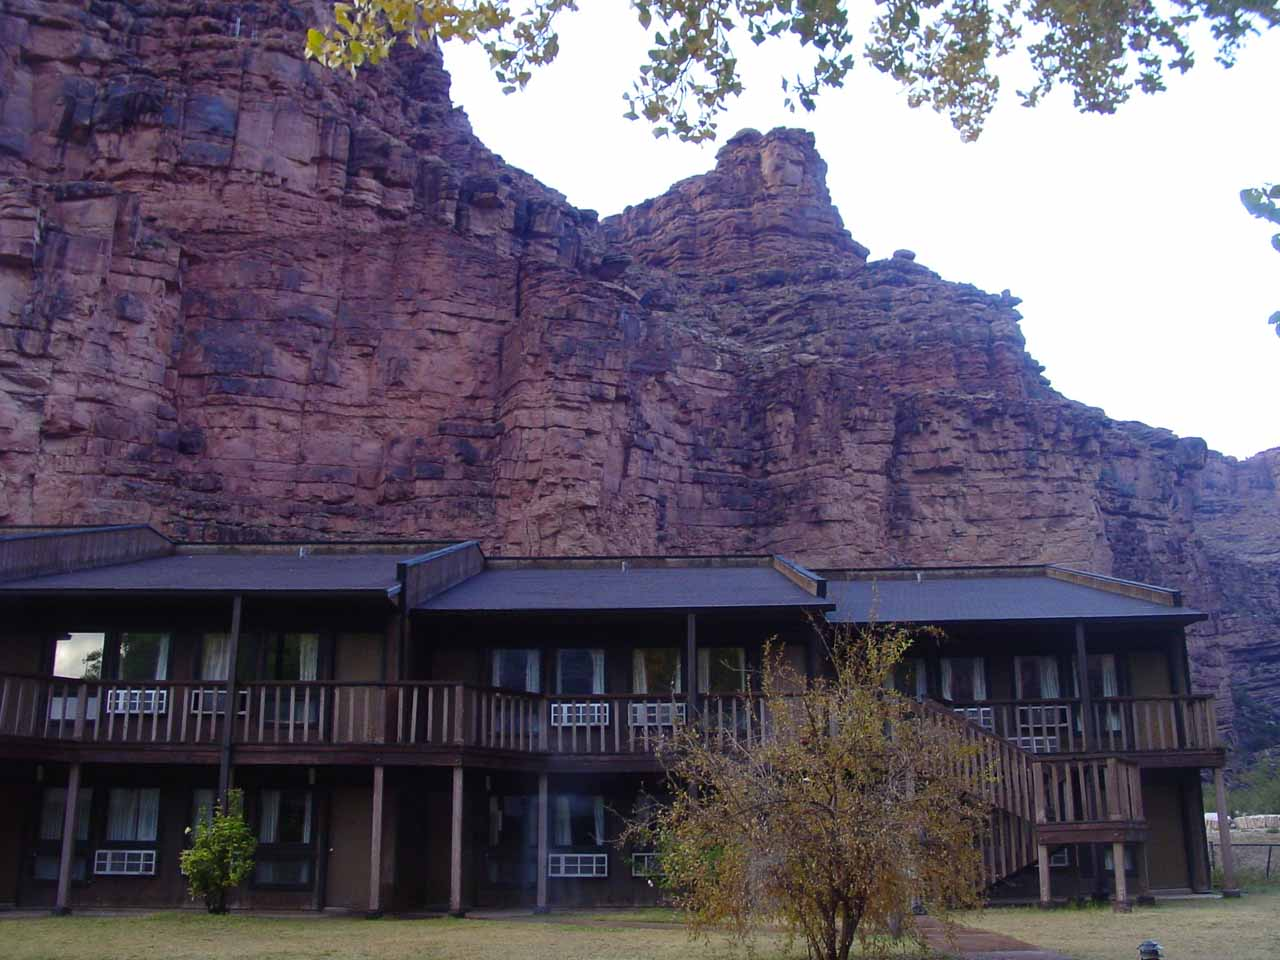 A last look at the Havasupai Lodge before leaving